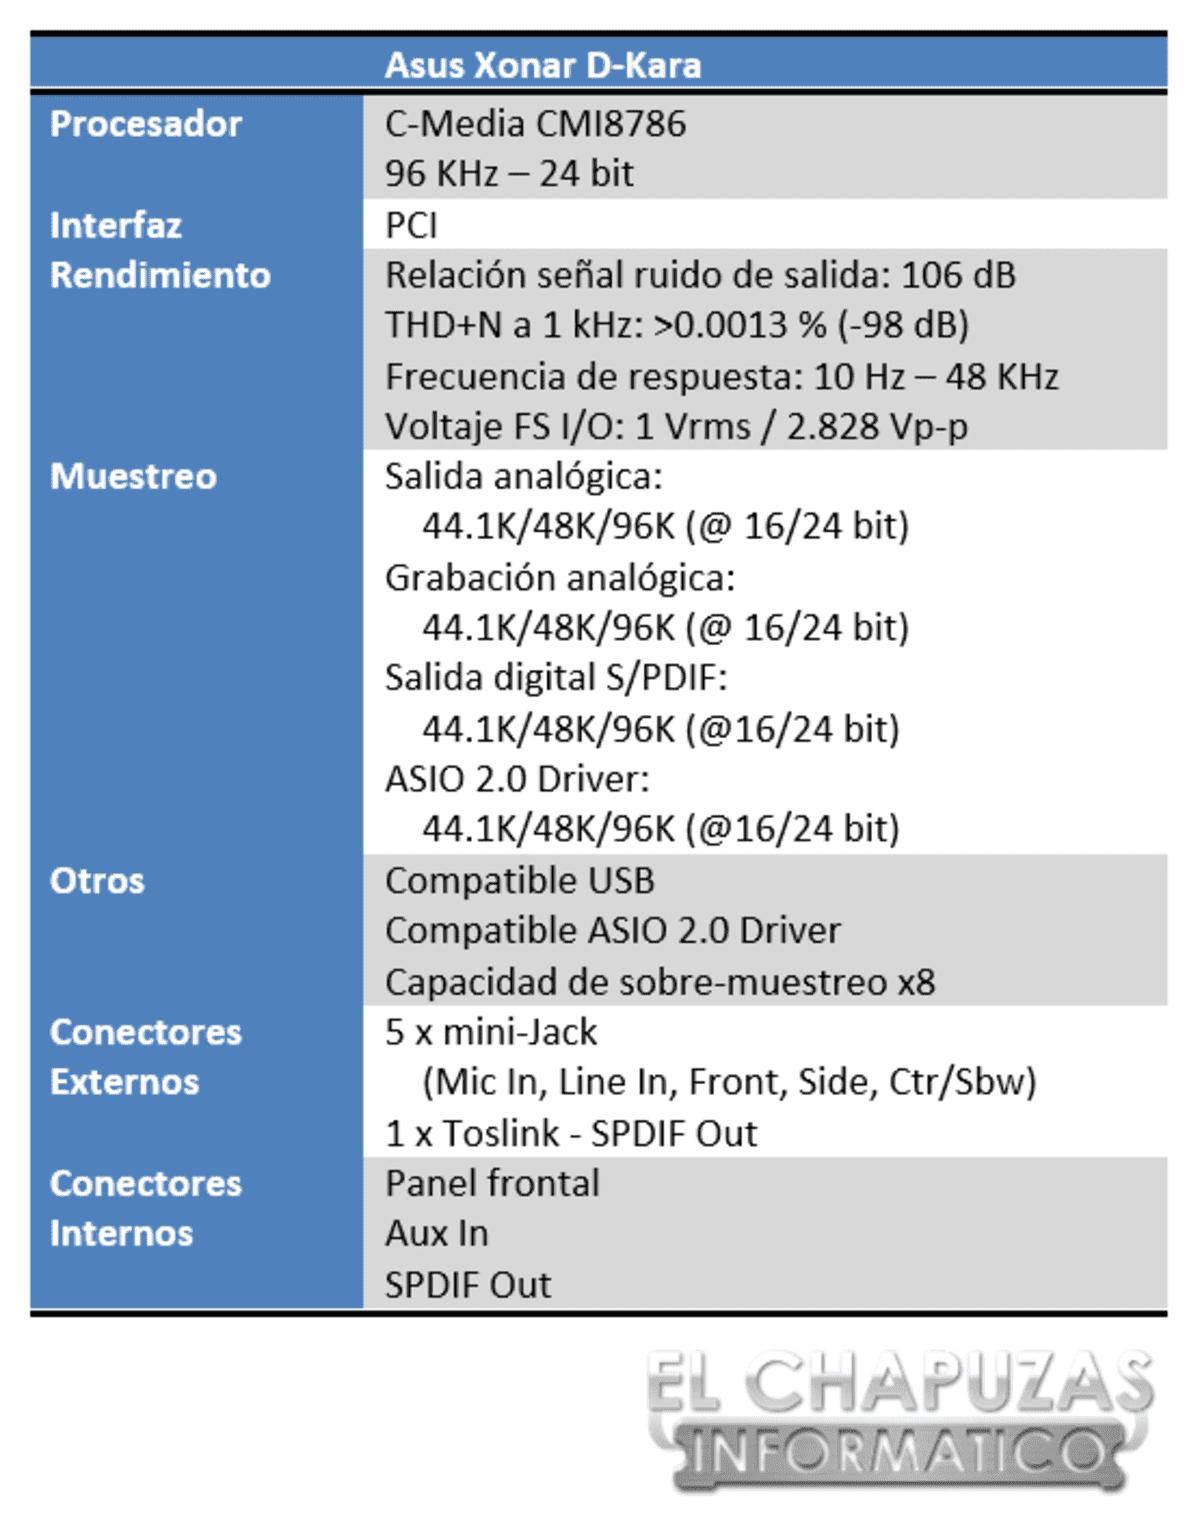 Asus Xonar D Kara Especificaciones 1